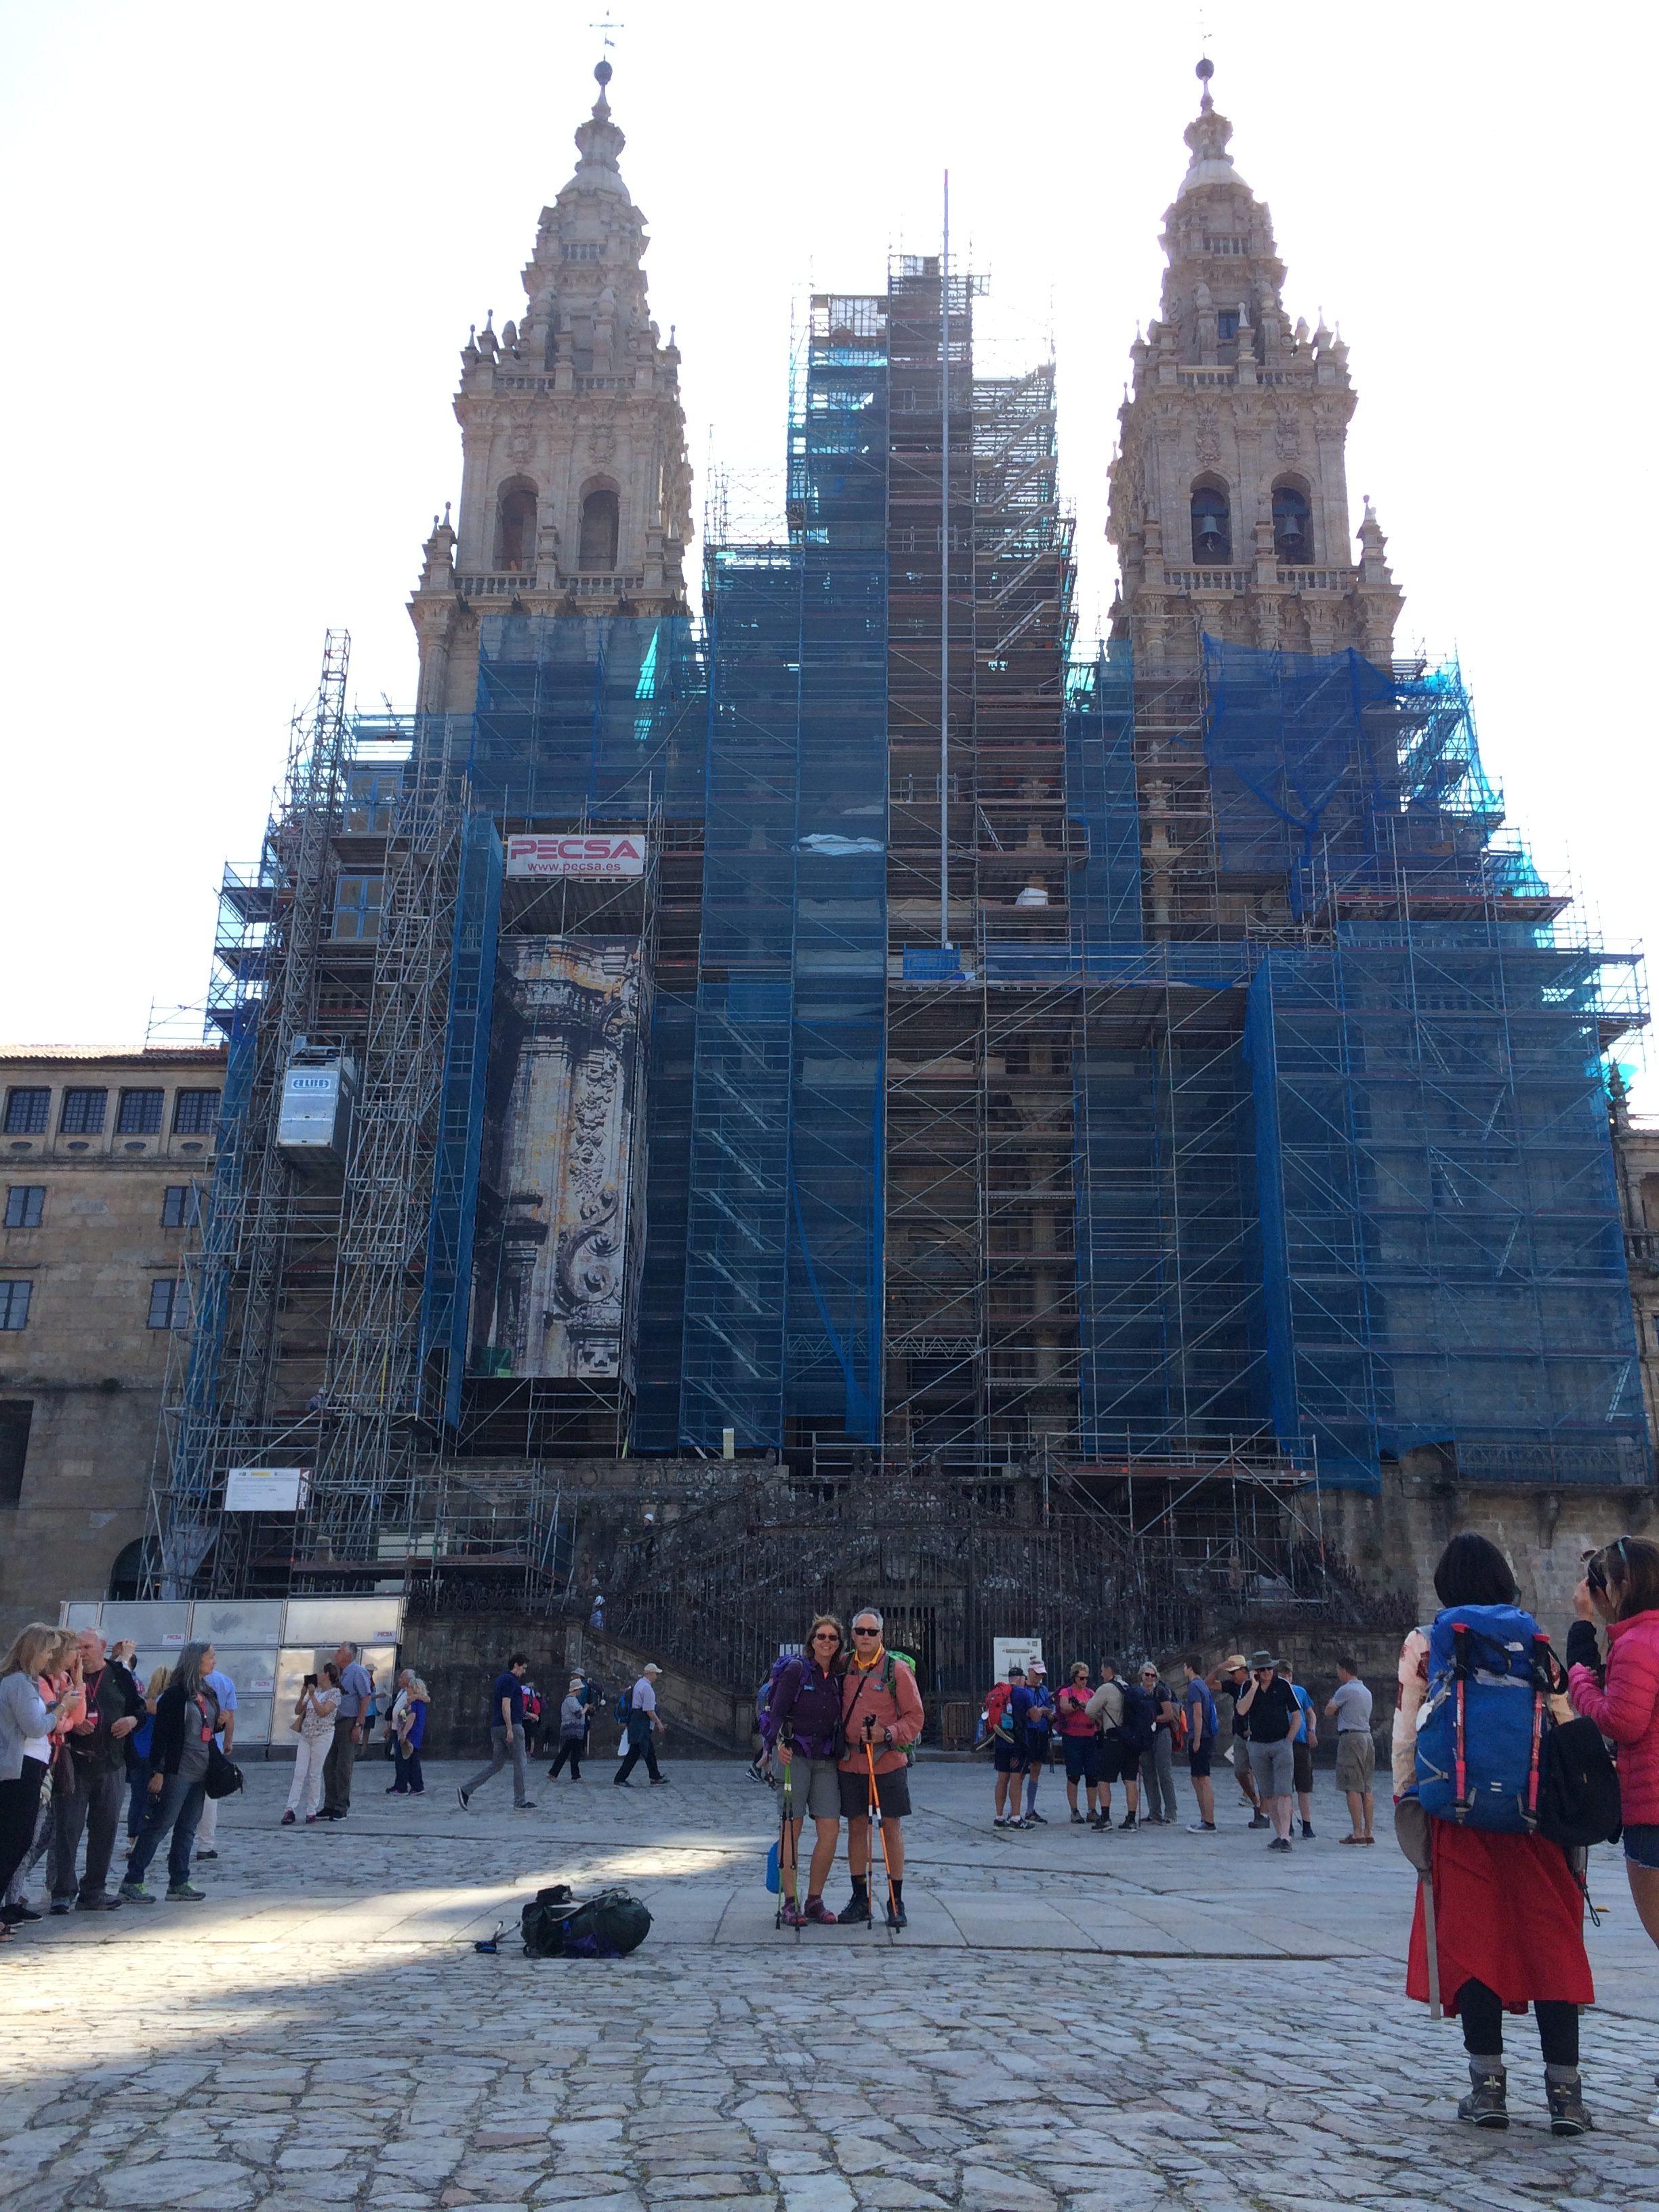 Day 43 - Lavacolla to Santiago de Compostela - June 16, 2017